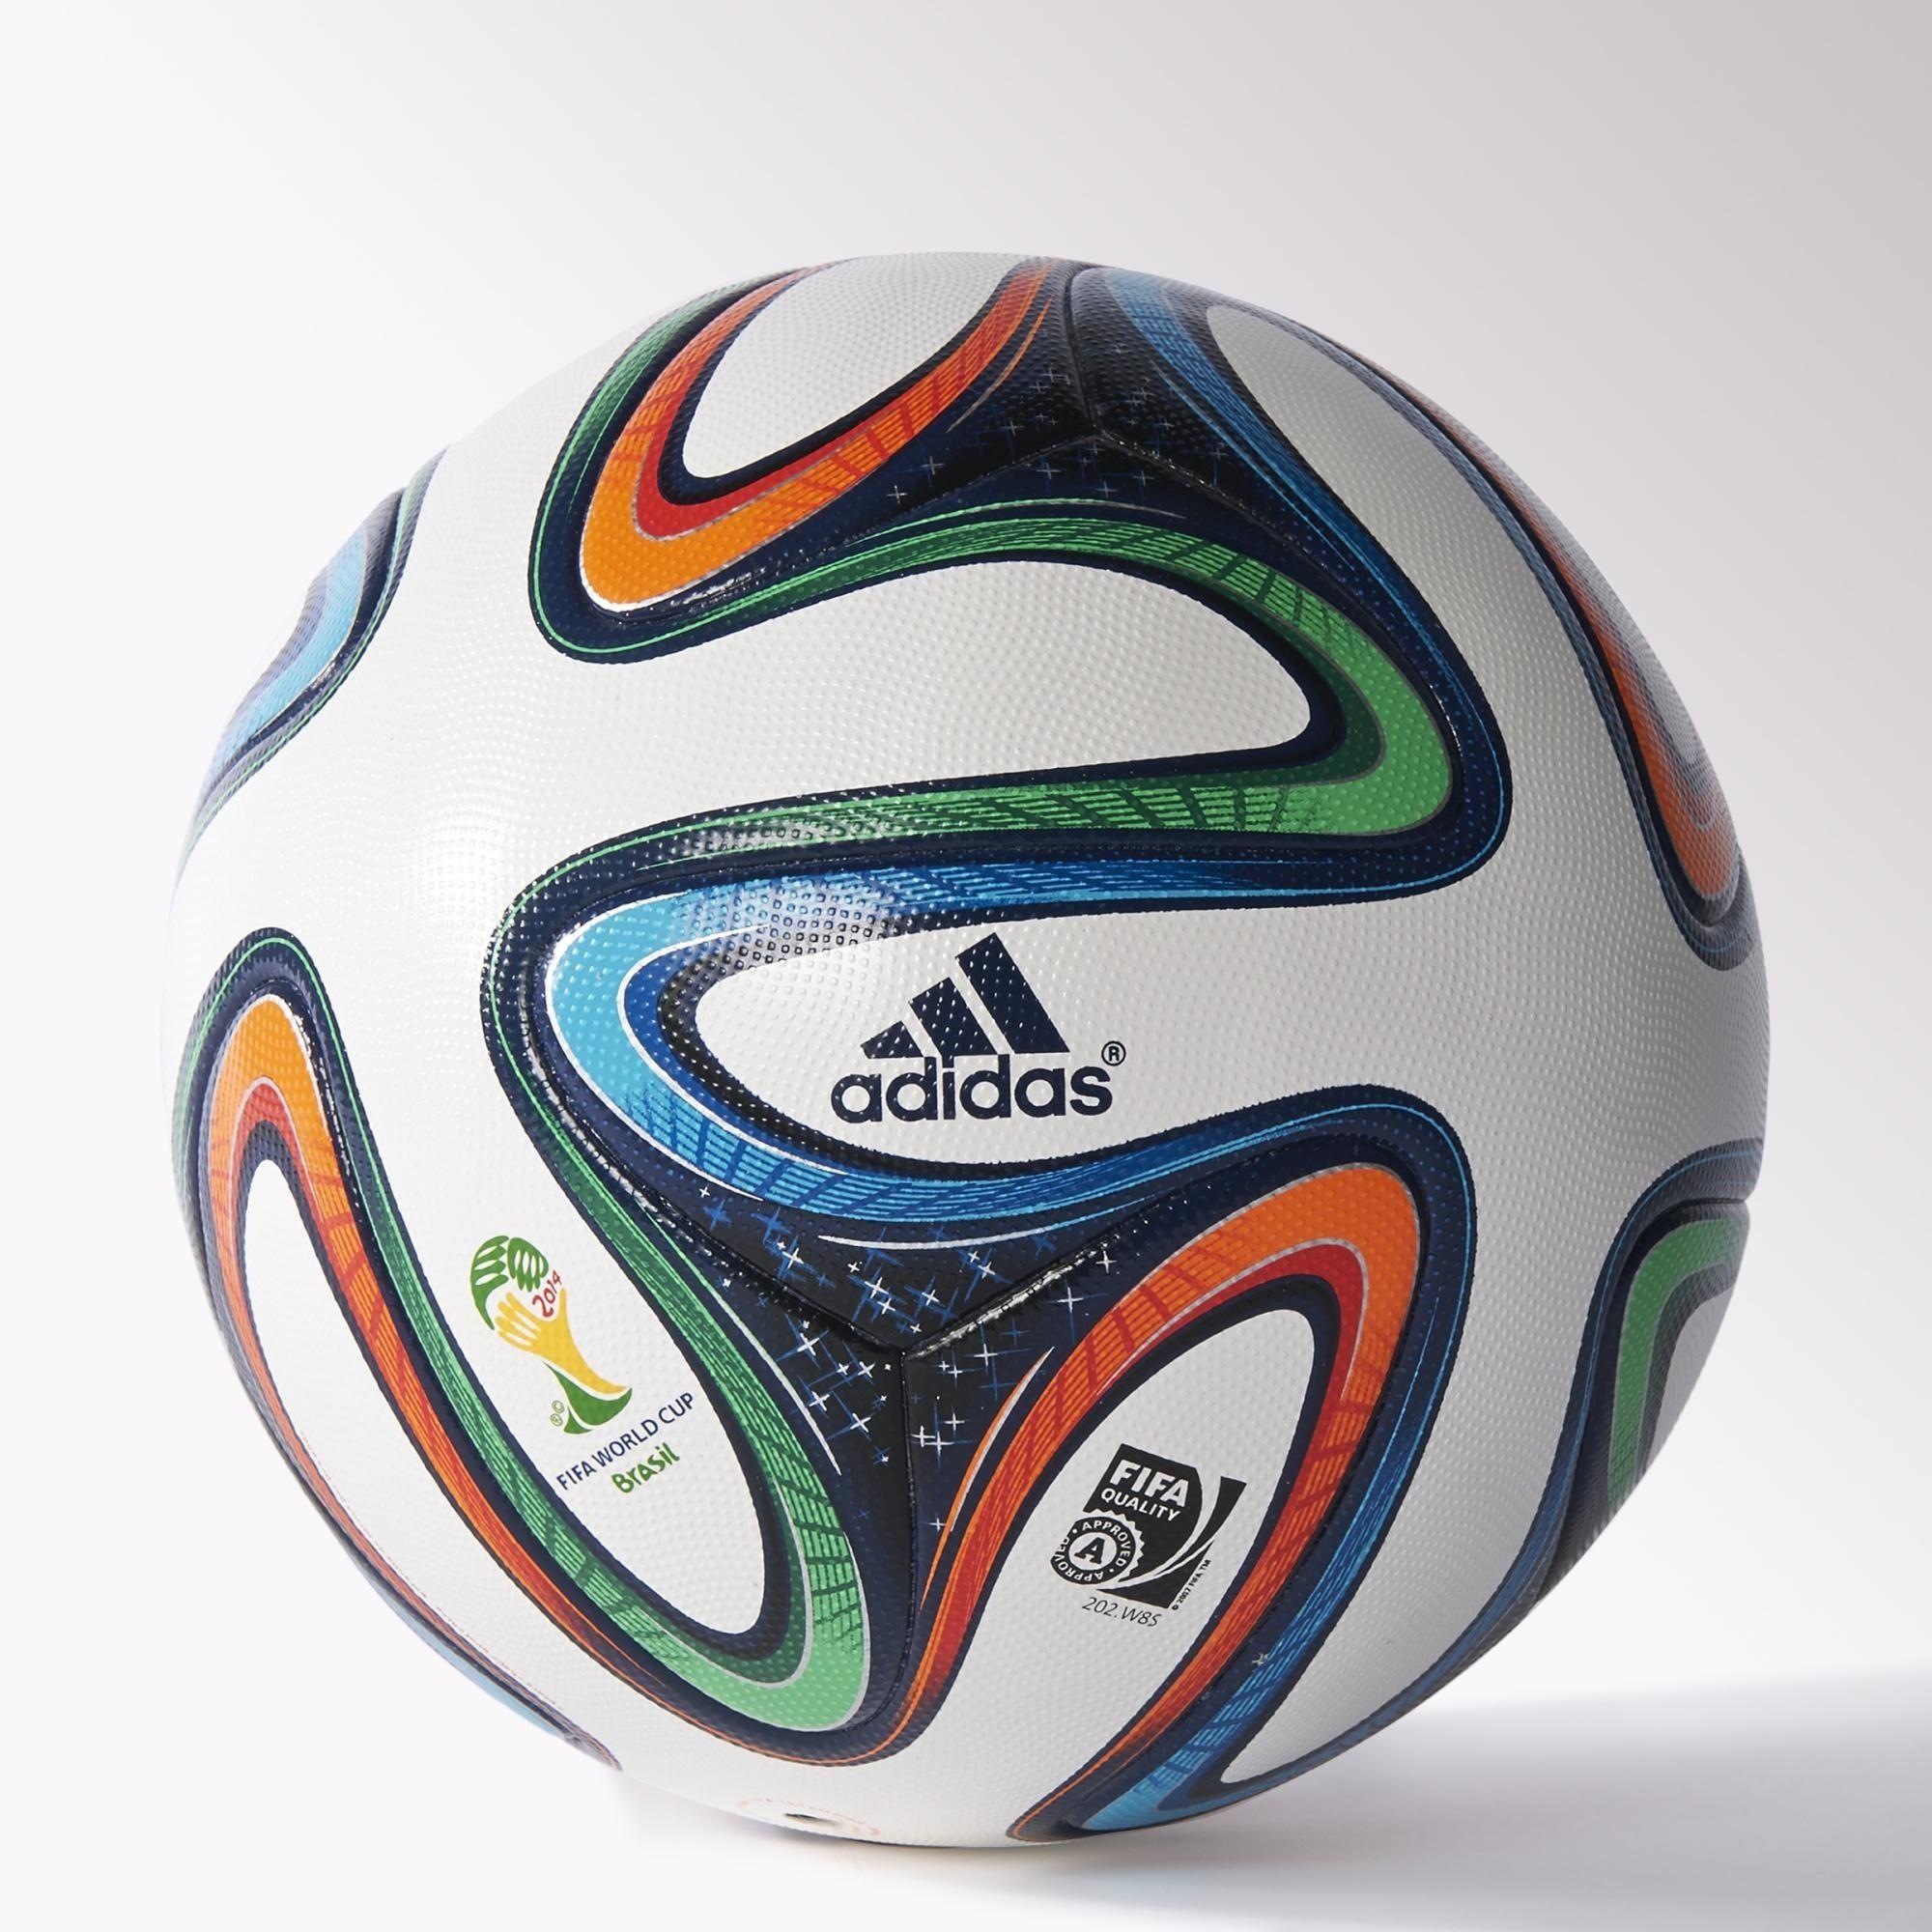 e6103fab8a Adidas brazuca official match ball adidas canada athletes jpg 2000x2000 Adidas  brazuca